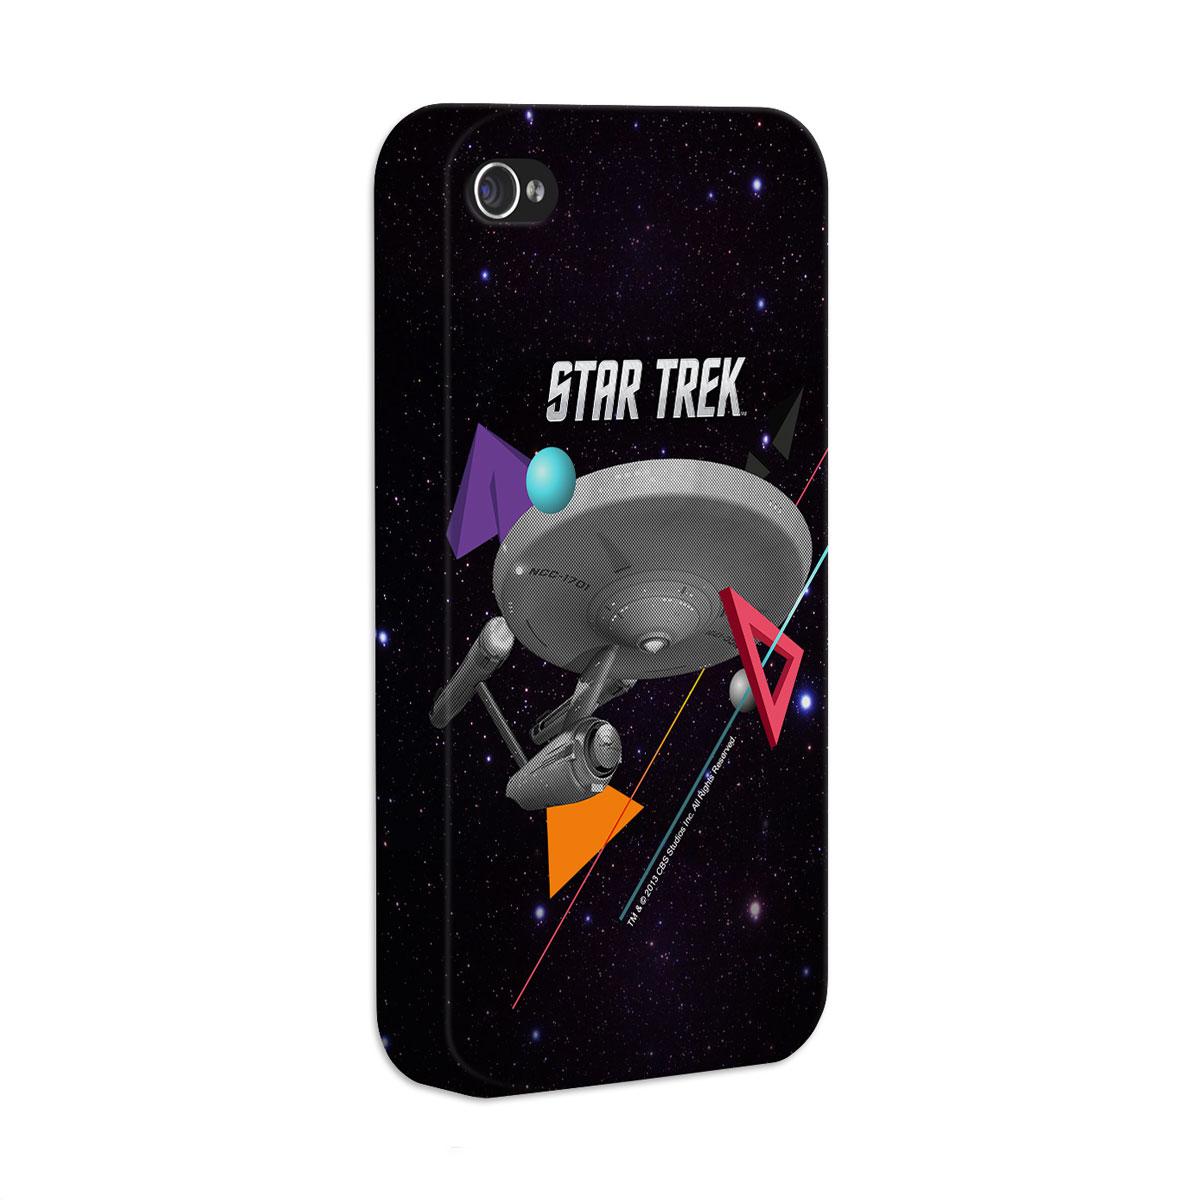 Capa de iPhone 4/4S Star Trek Enterprise